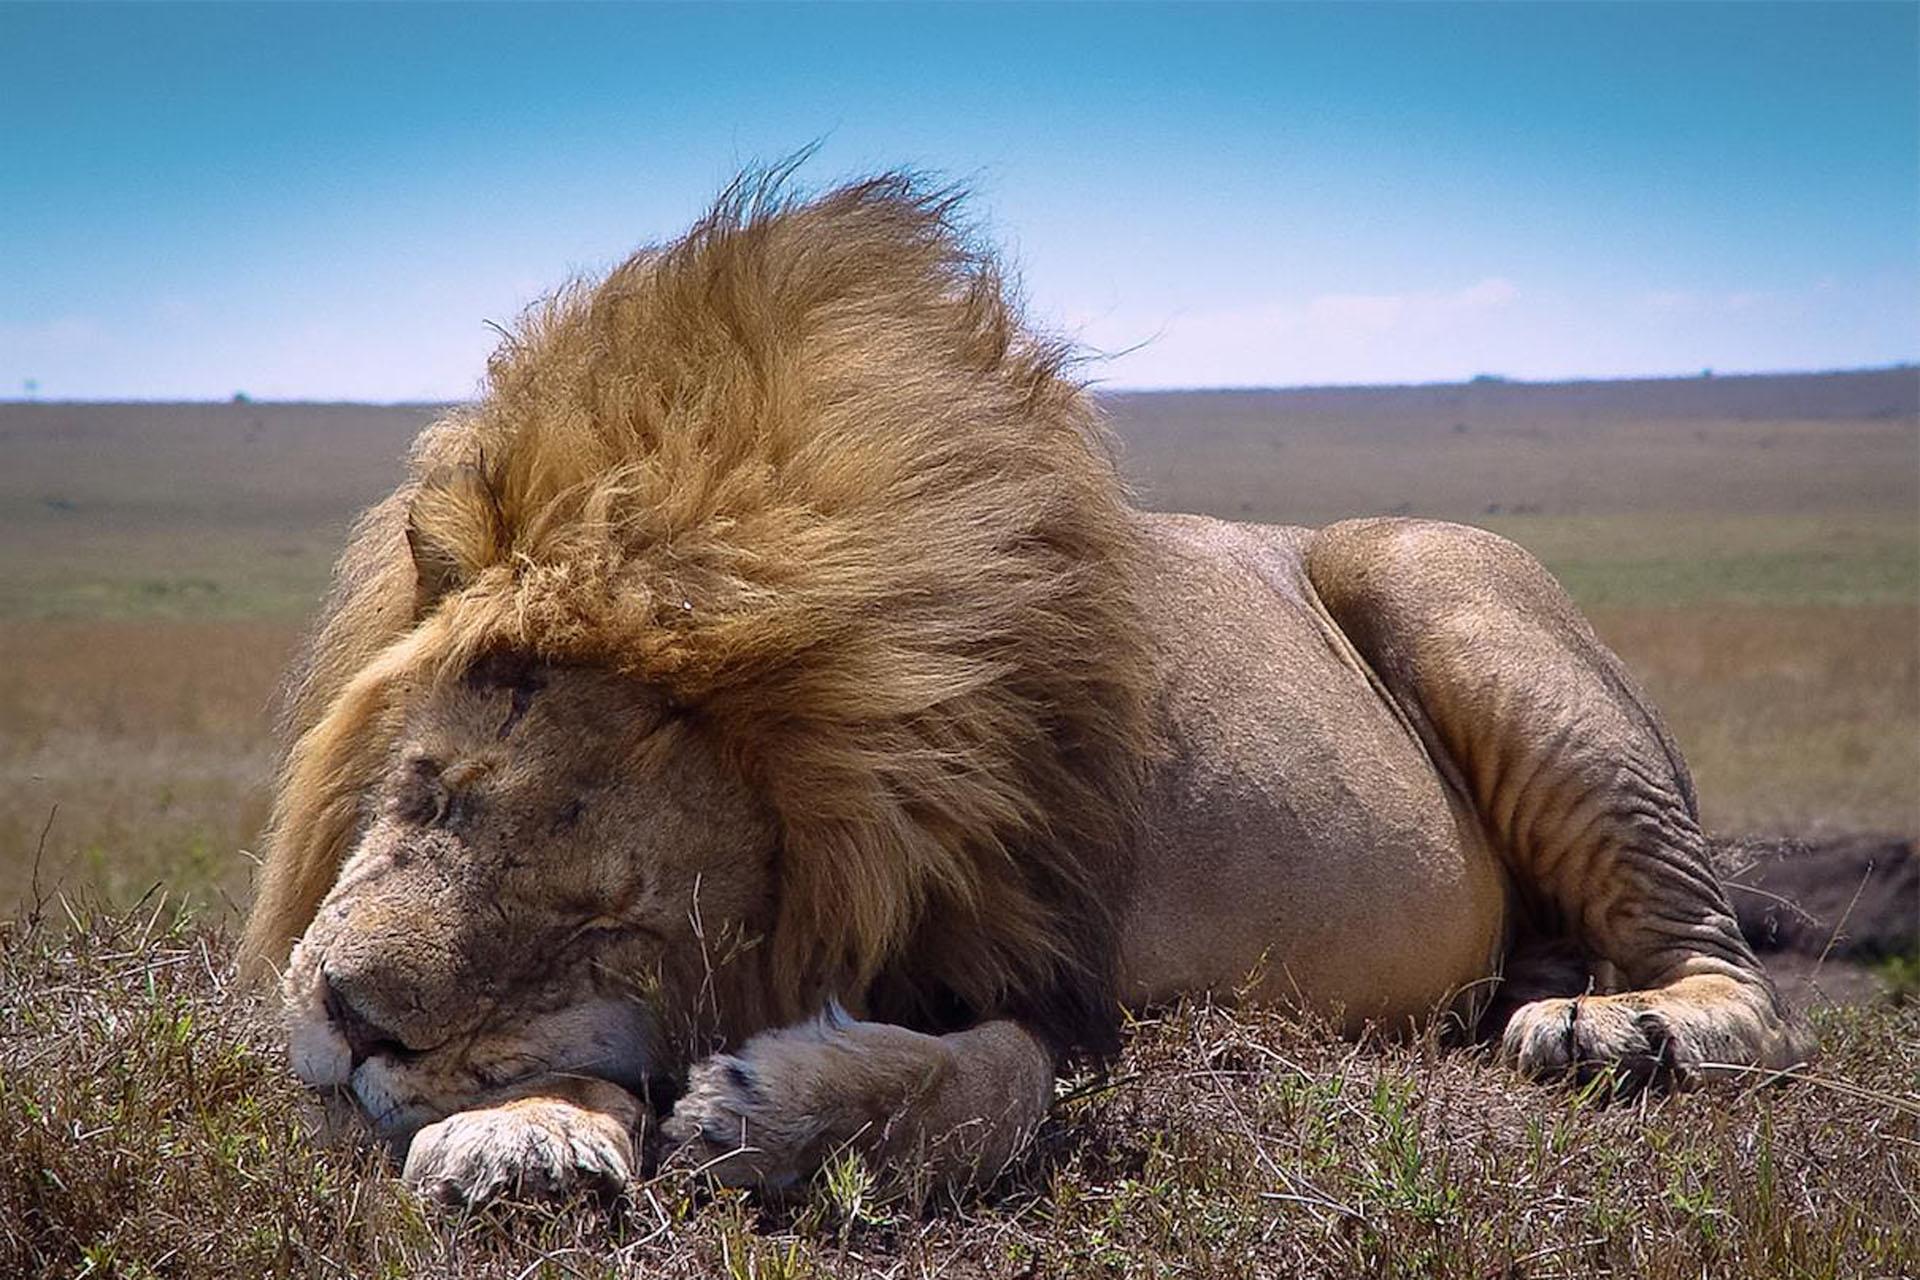 Gigantic lion asleep © Saba-Douglas-Hamilton